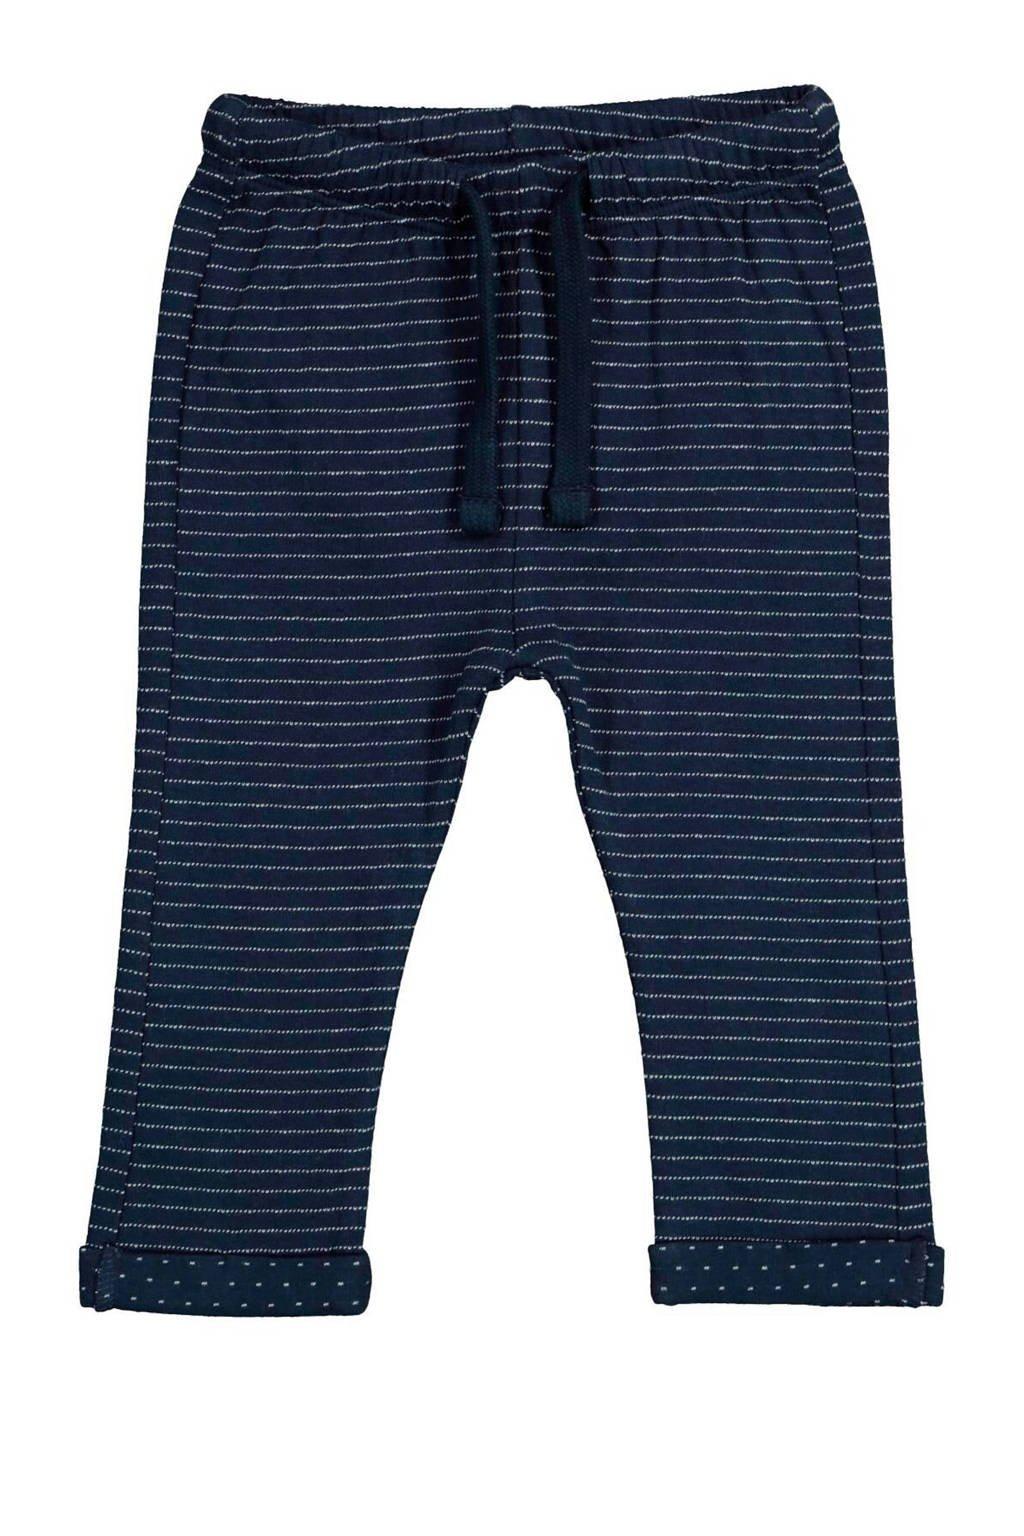 HEMA gestreepte broek donkerblauw, Donkerblauw